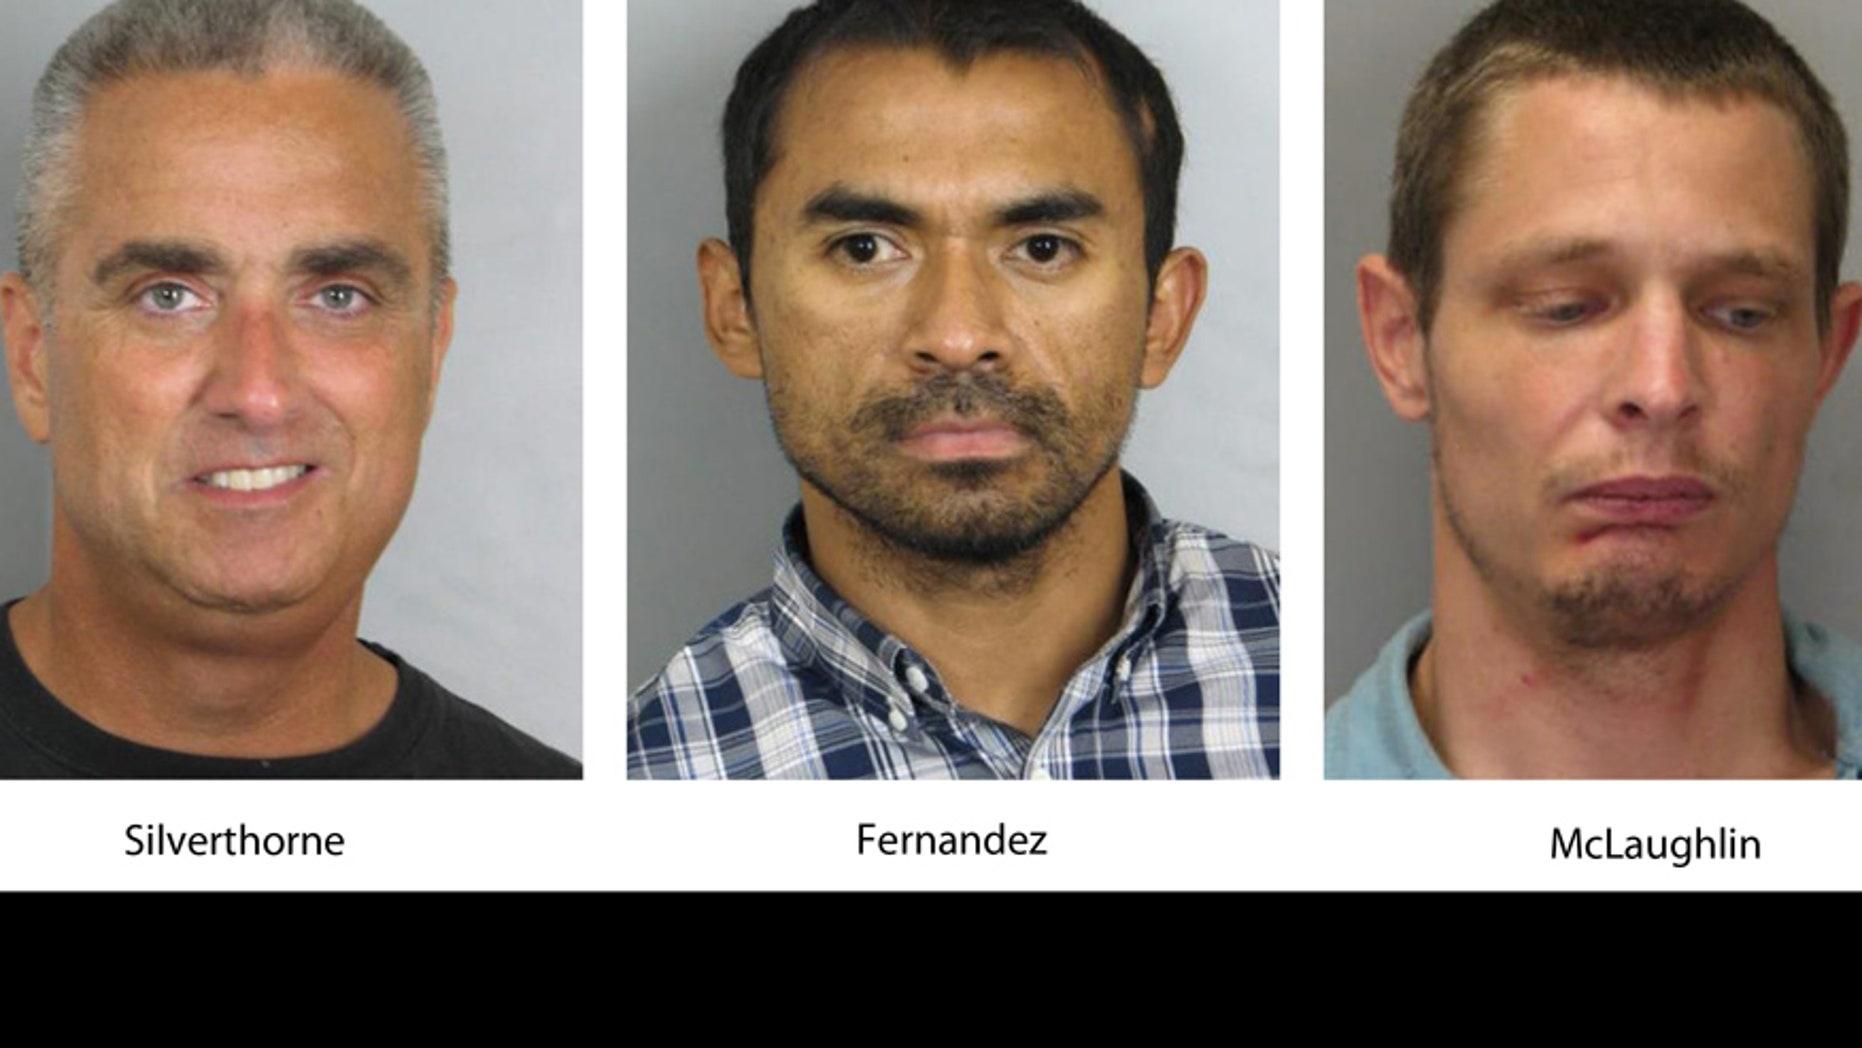 City of Fairfax Mayor Richard Scott Silverthorne, Juan Jose Fernandez, 34, and Caustin Lee McLaughlin, 21. (Fairfax County, Va., Police Department via AP)